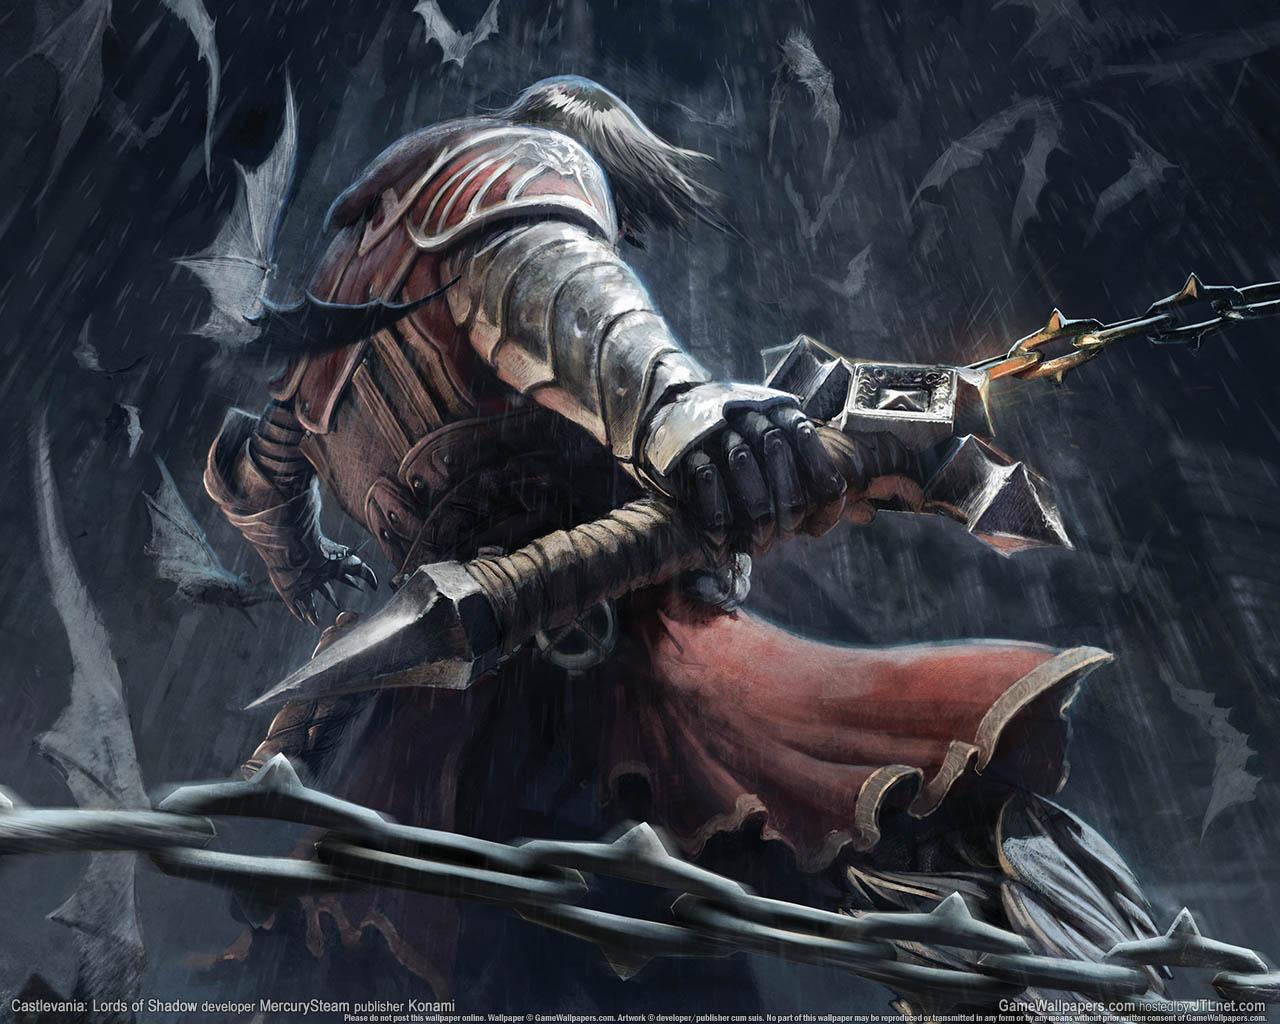 Gamesradar reviews Castlevania Lords of Shadow: 9/10